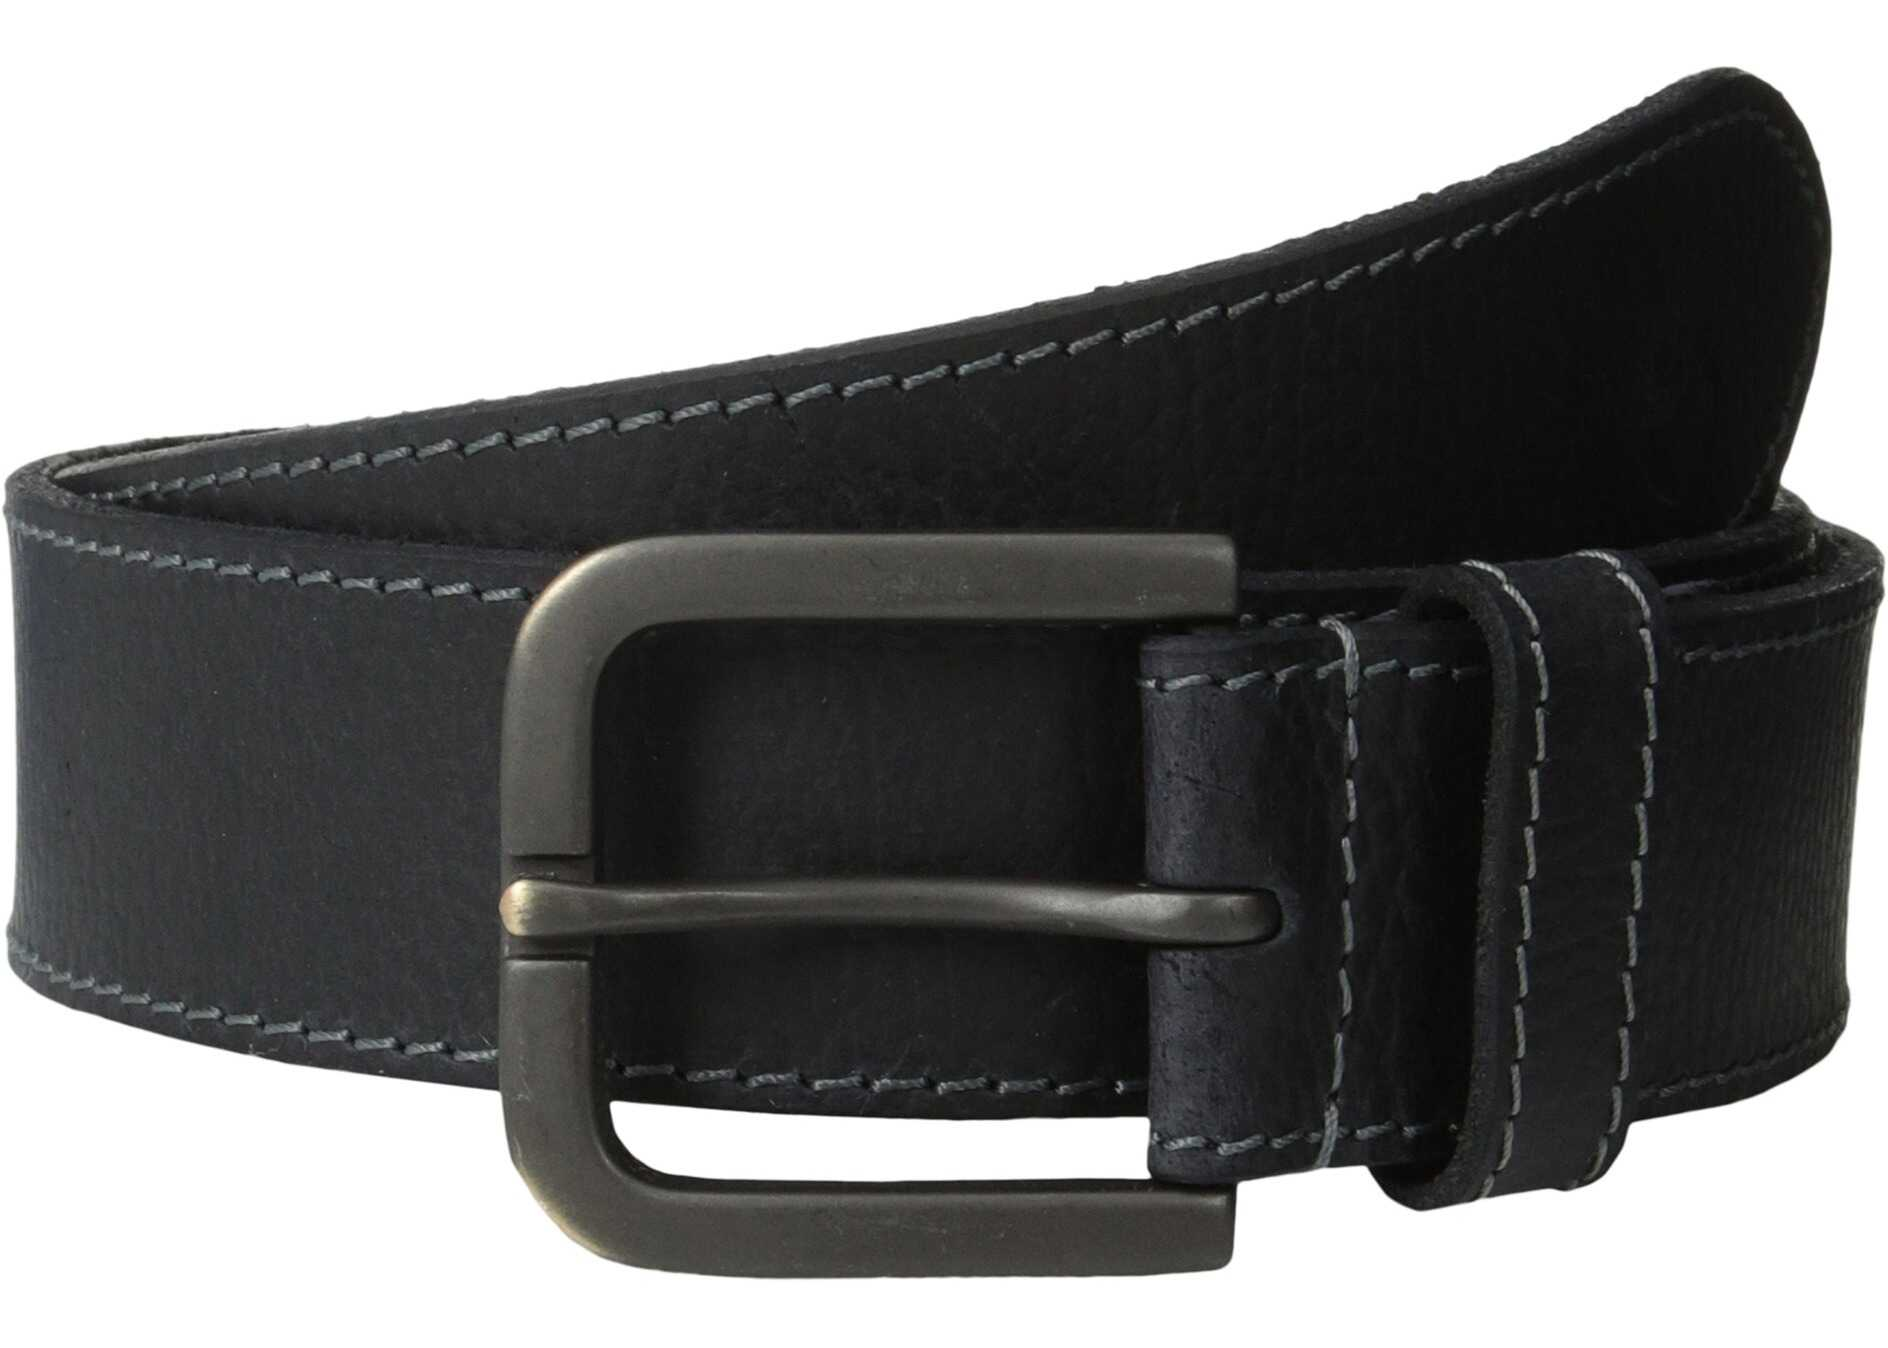 40mm Oily Milled Belt